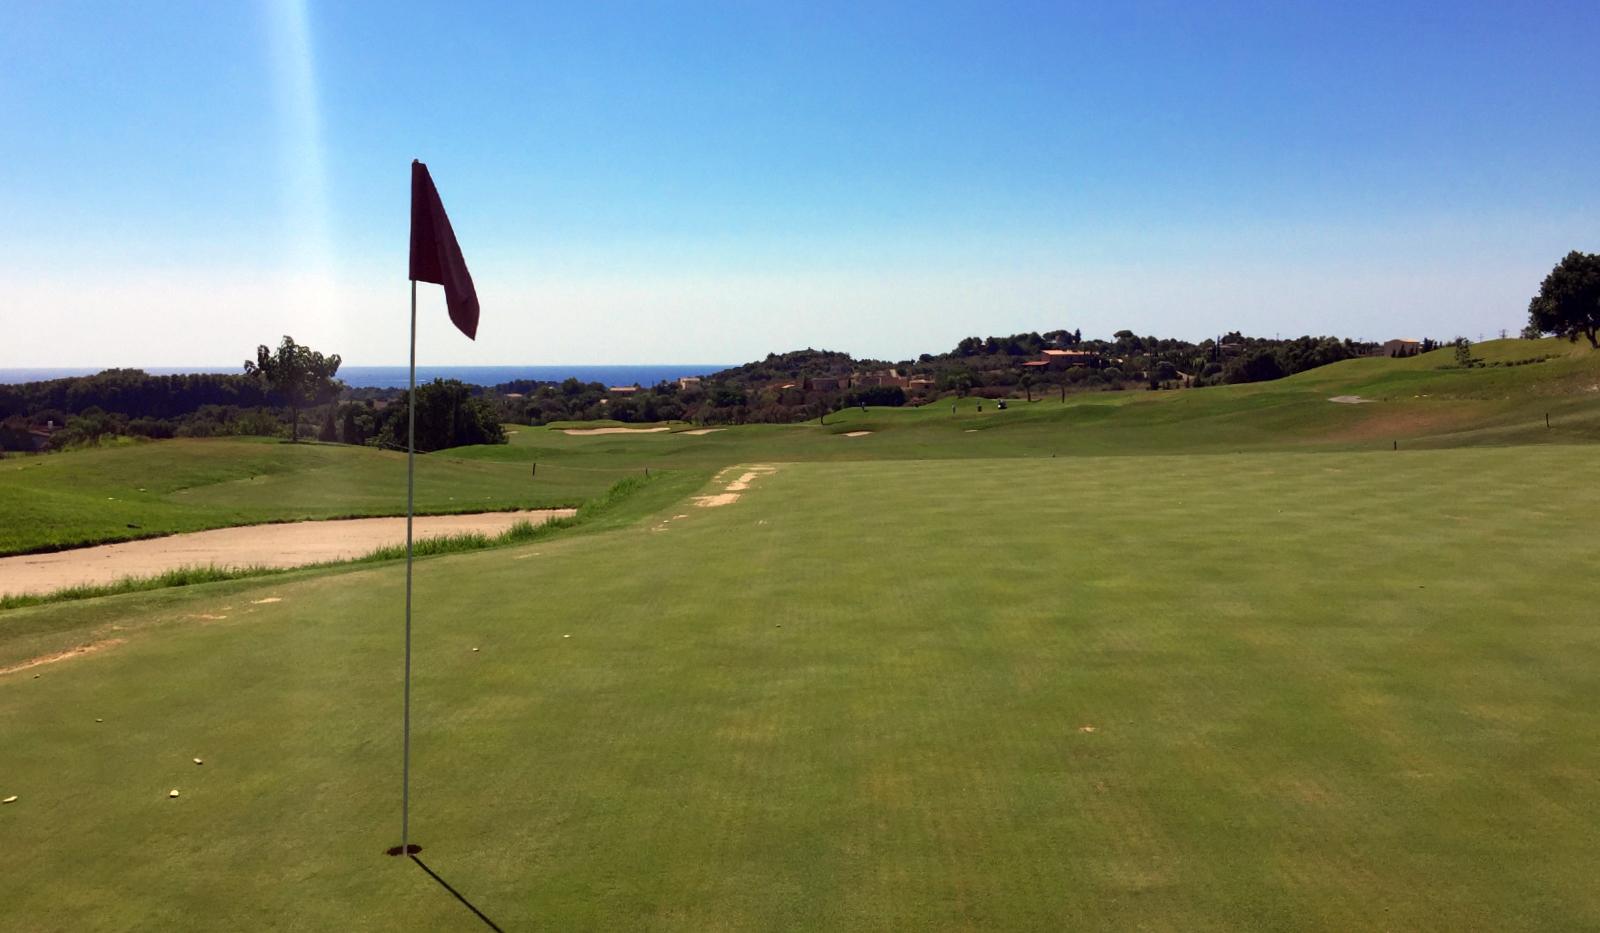 Pula Golf 2 GolfnStyle Mallorca Golf Spielen - GOLF'n'STYLE - Silas Wagner bei Pula Golf - Mallorca